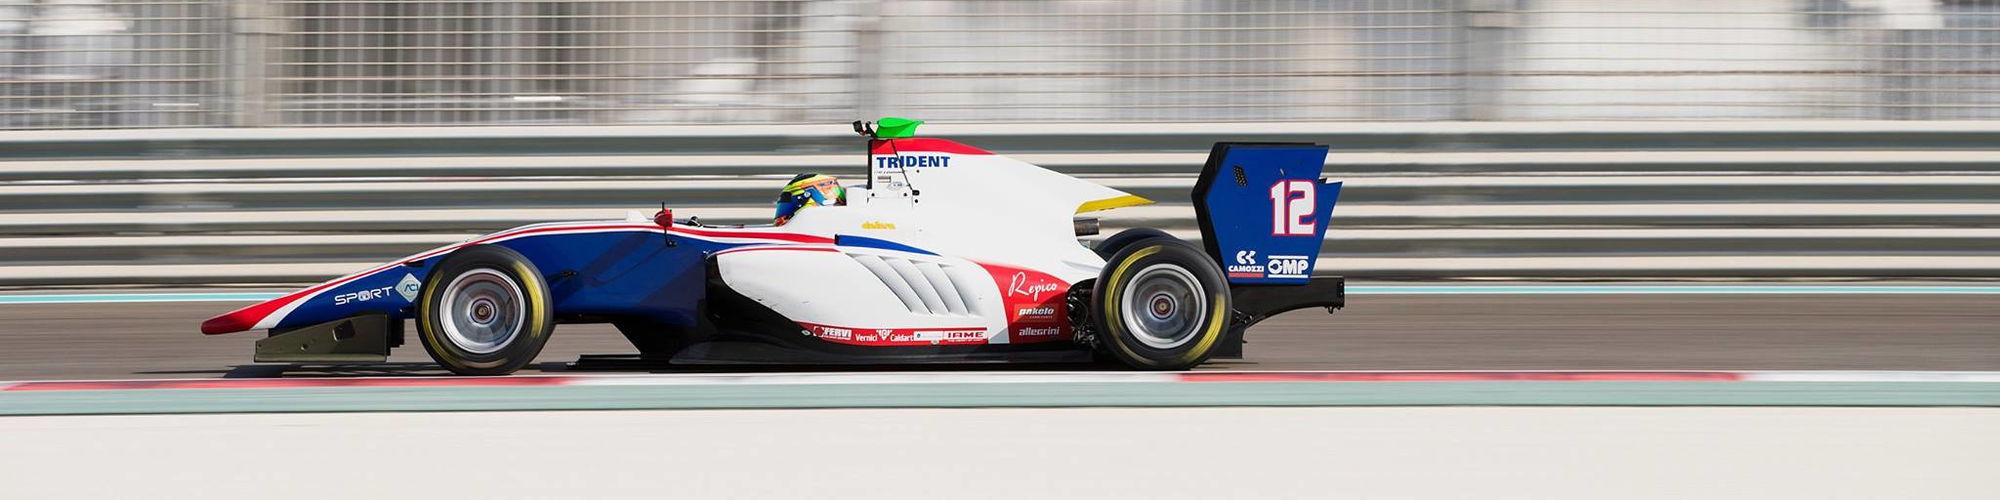 Trident Motorsport cover image